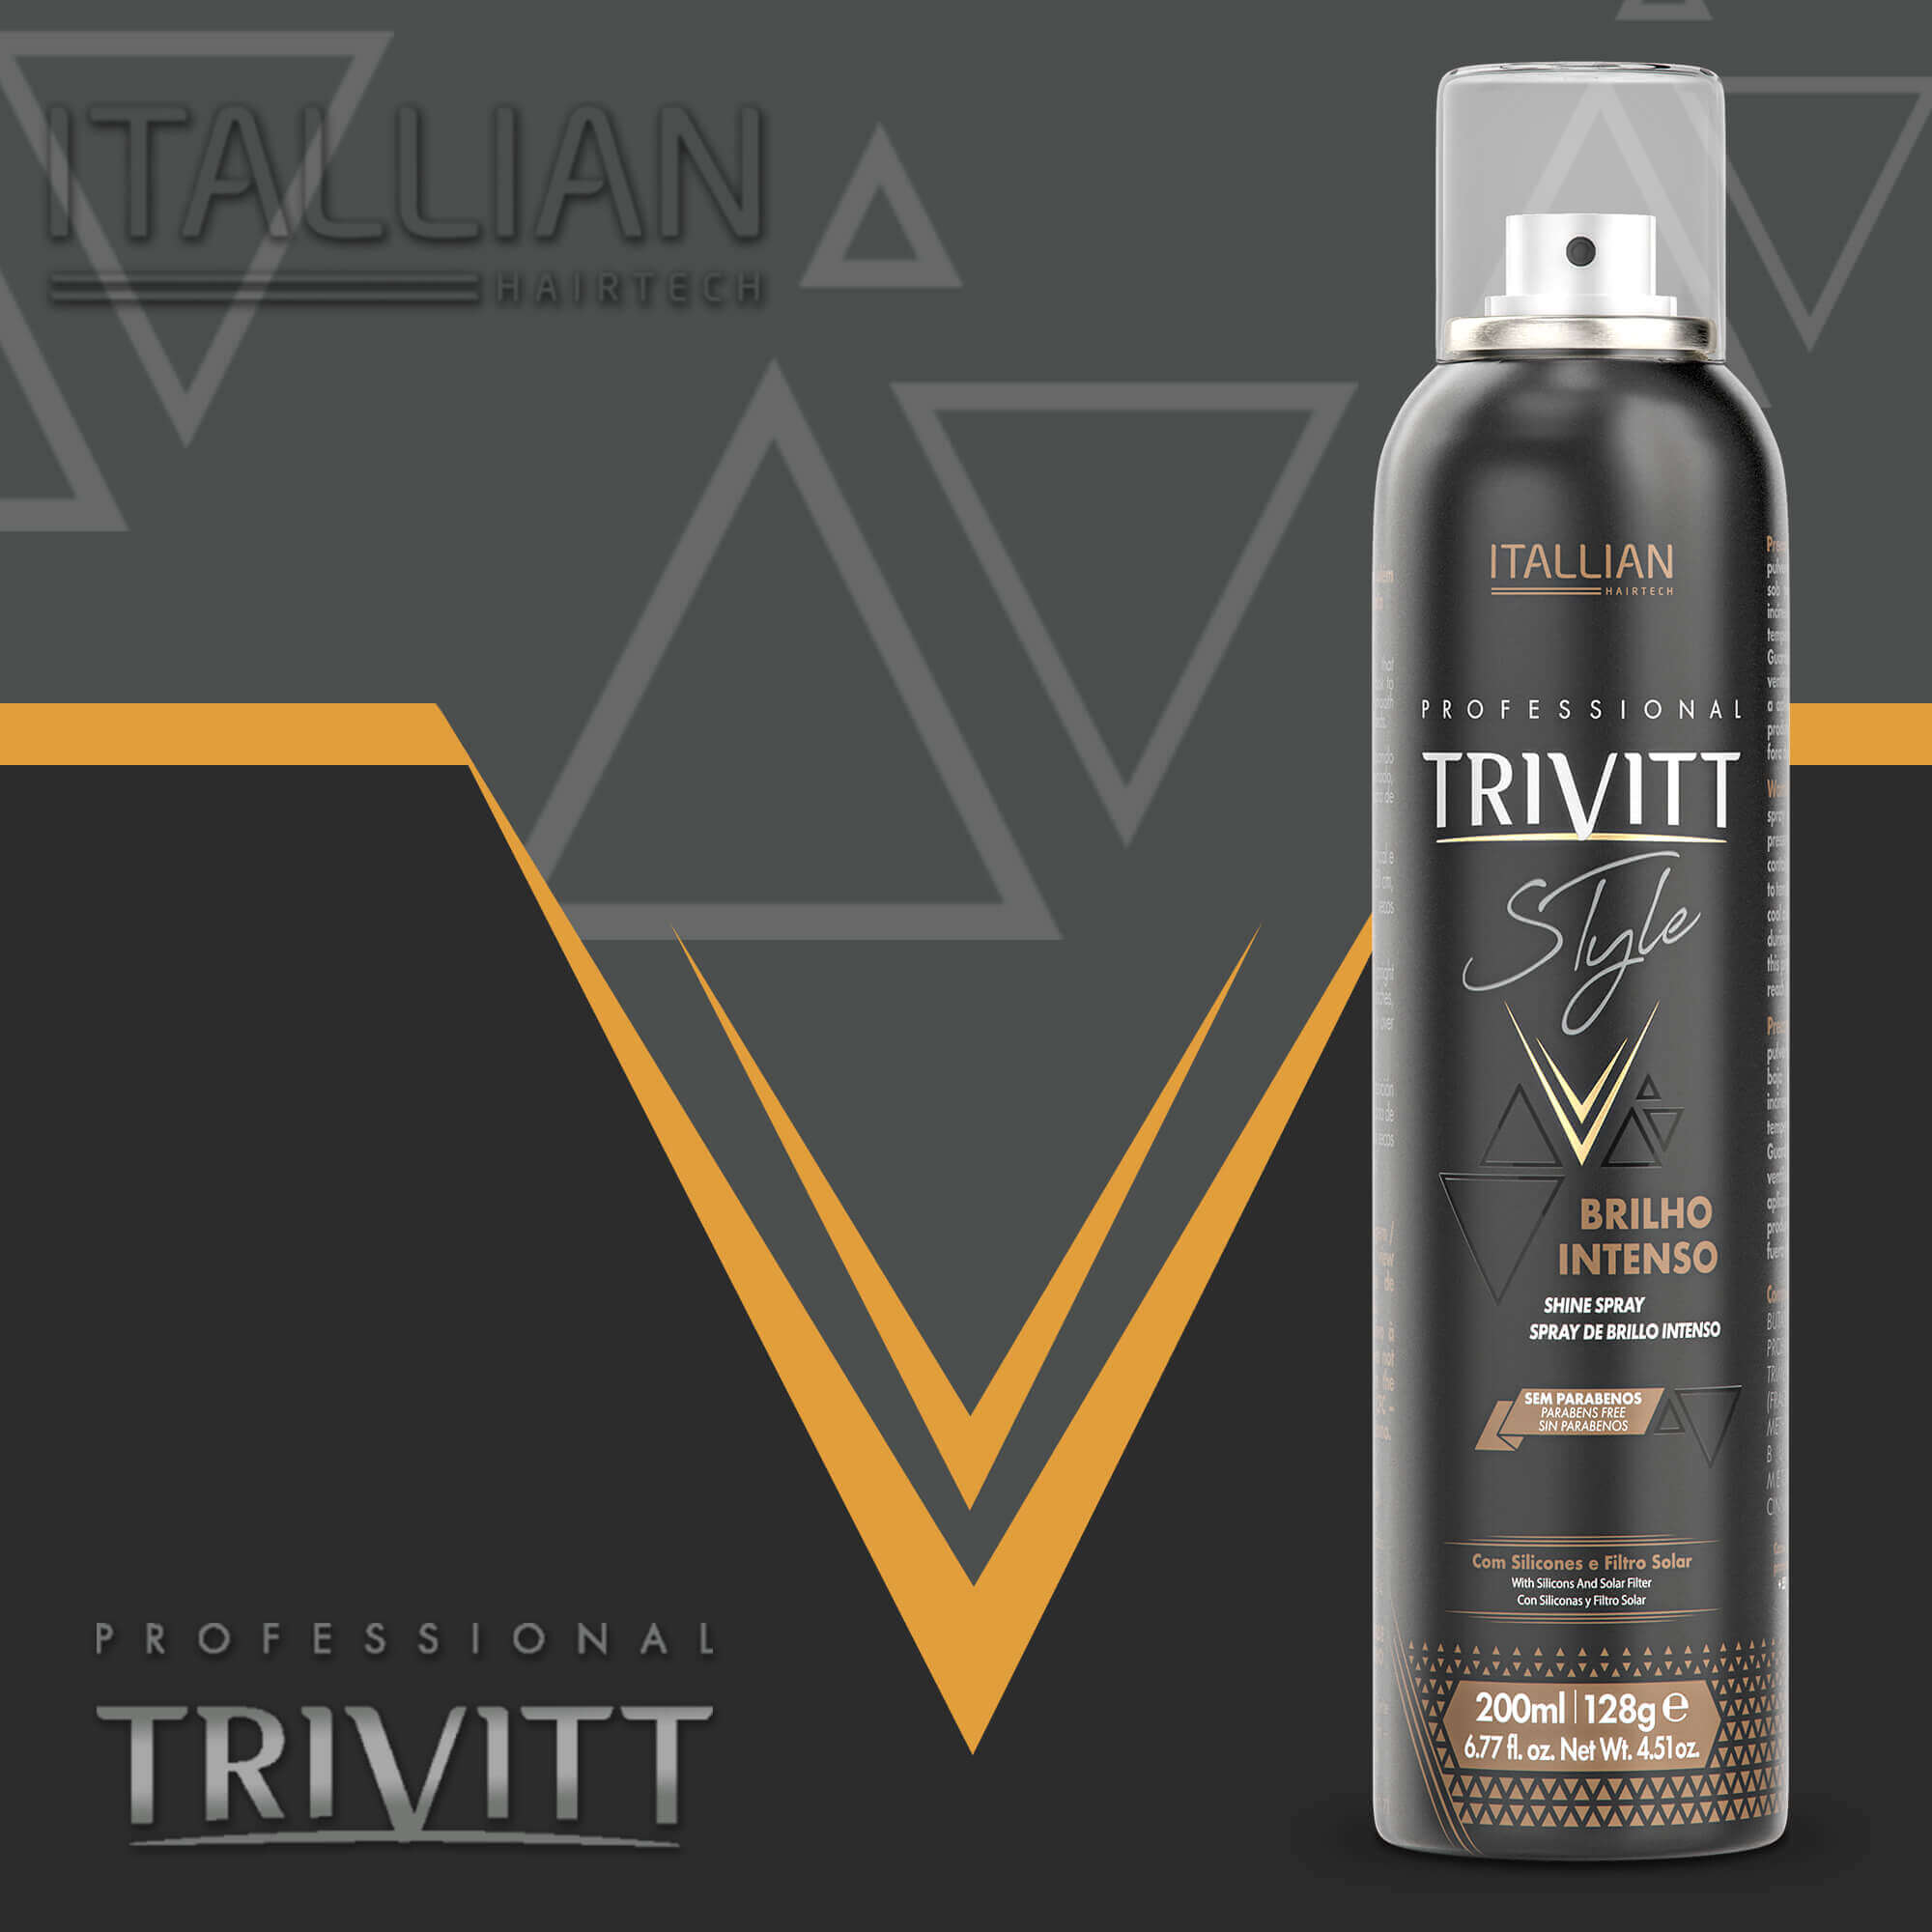 Itallian Trivitt Brilho Intenso 200ml